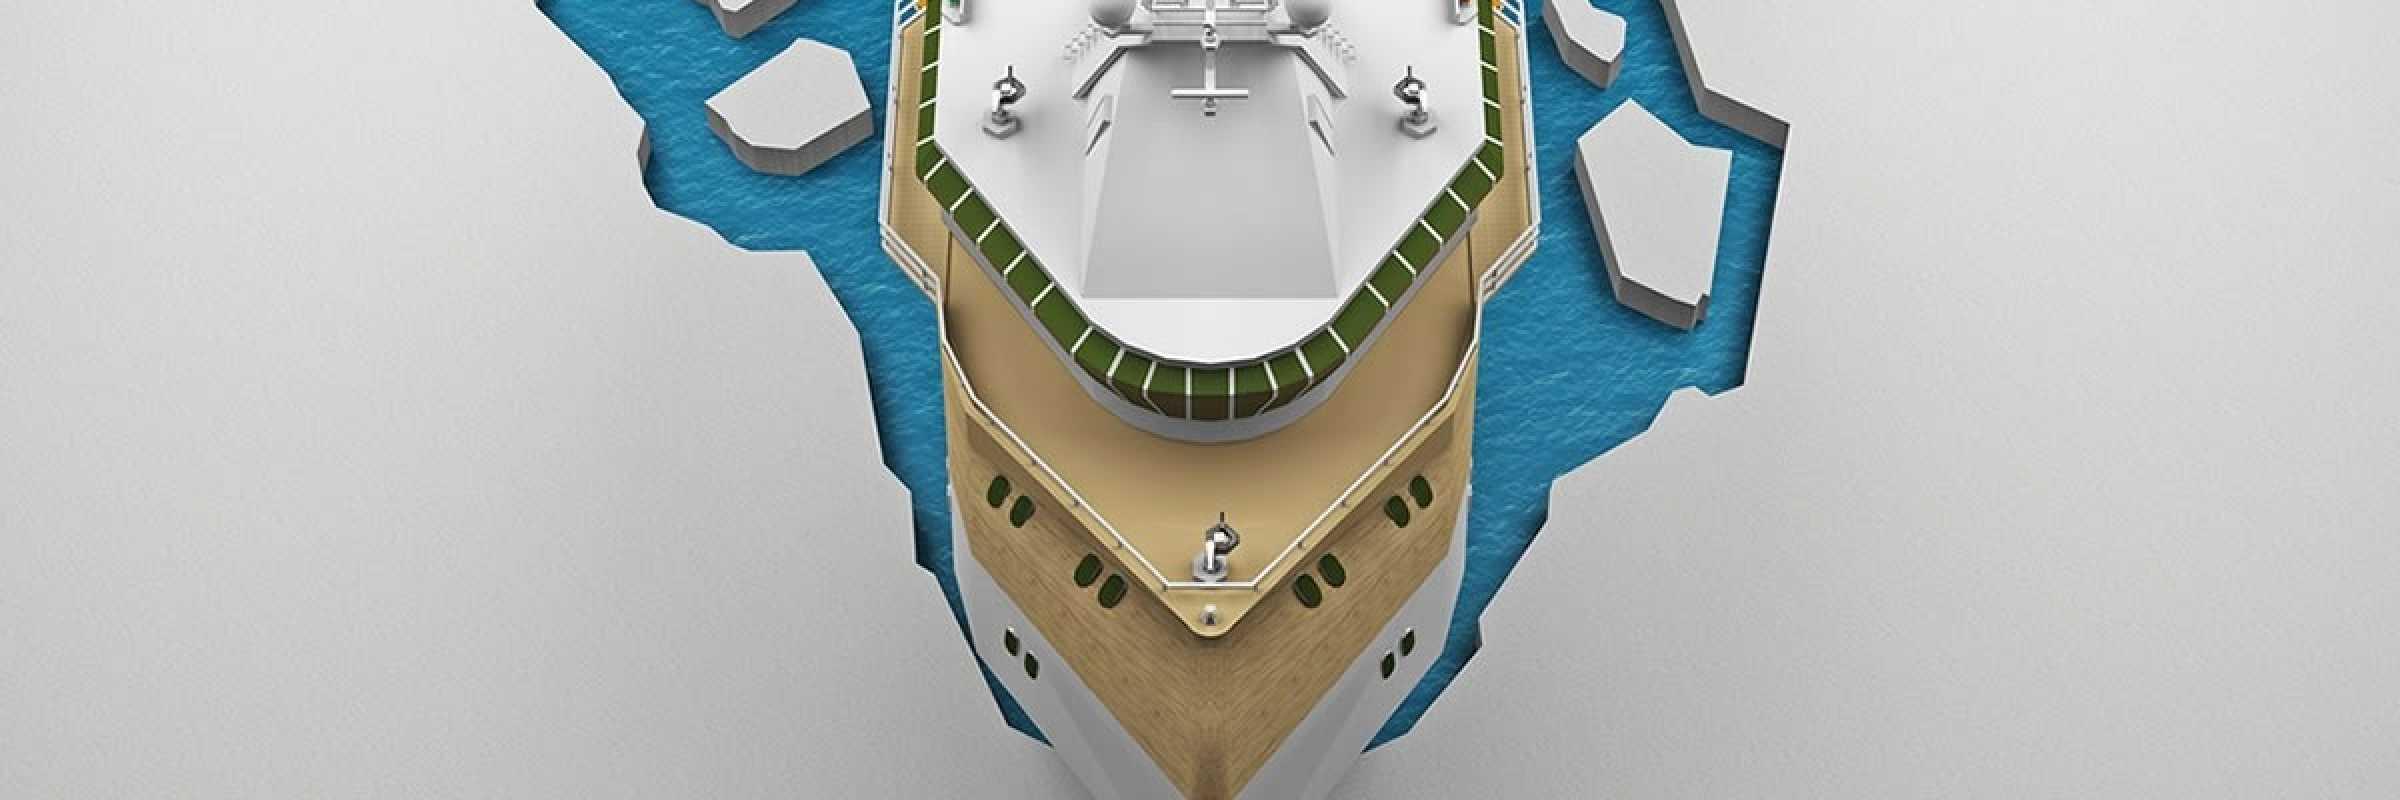 Danfoss provides power for removeable icebreaking bow